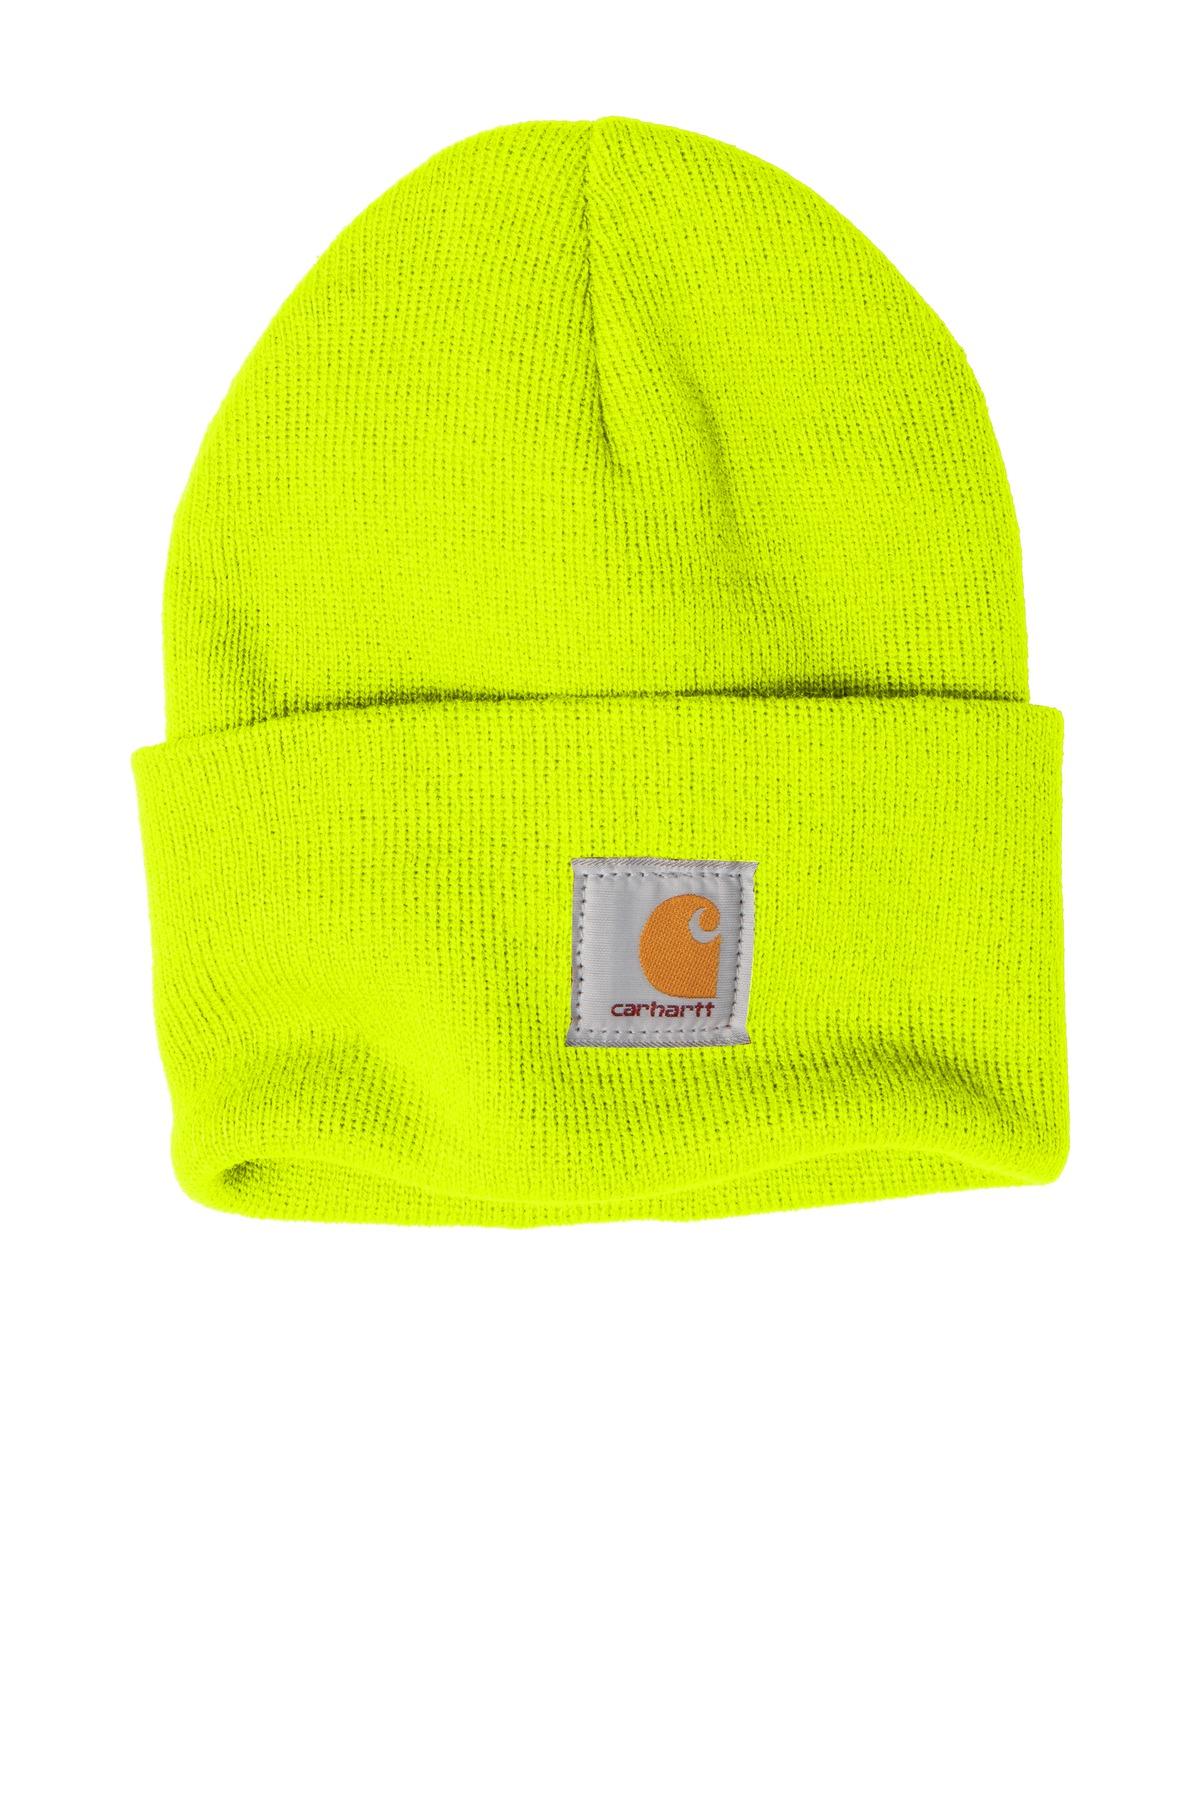 1cac357a0e3 Carhartt ® Acrylic Watch Hat. CTA18